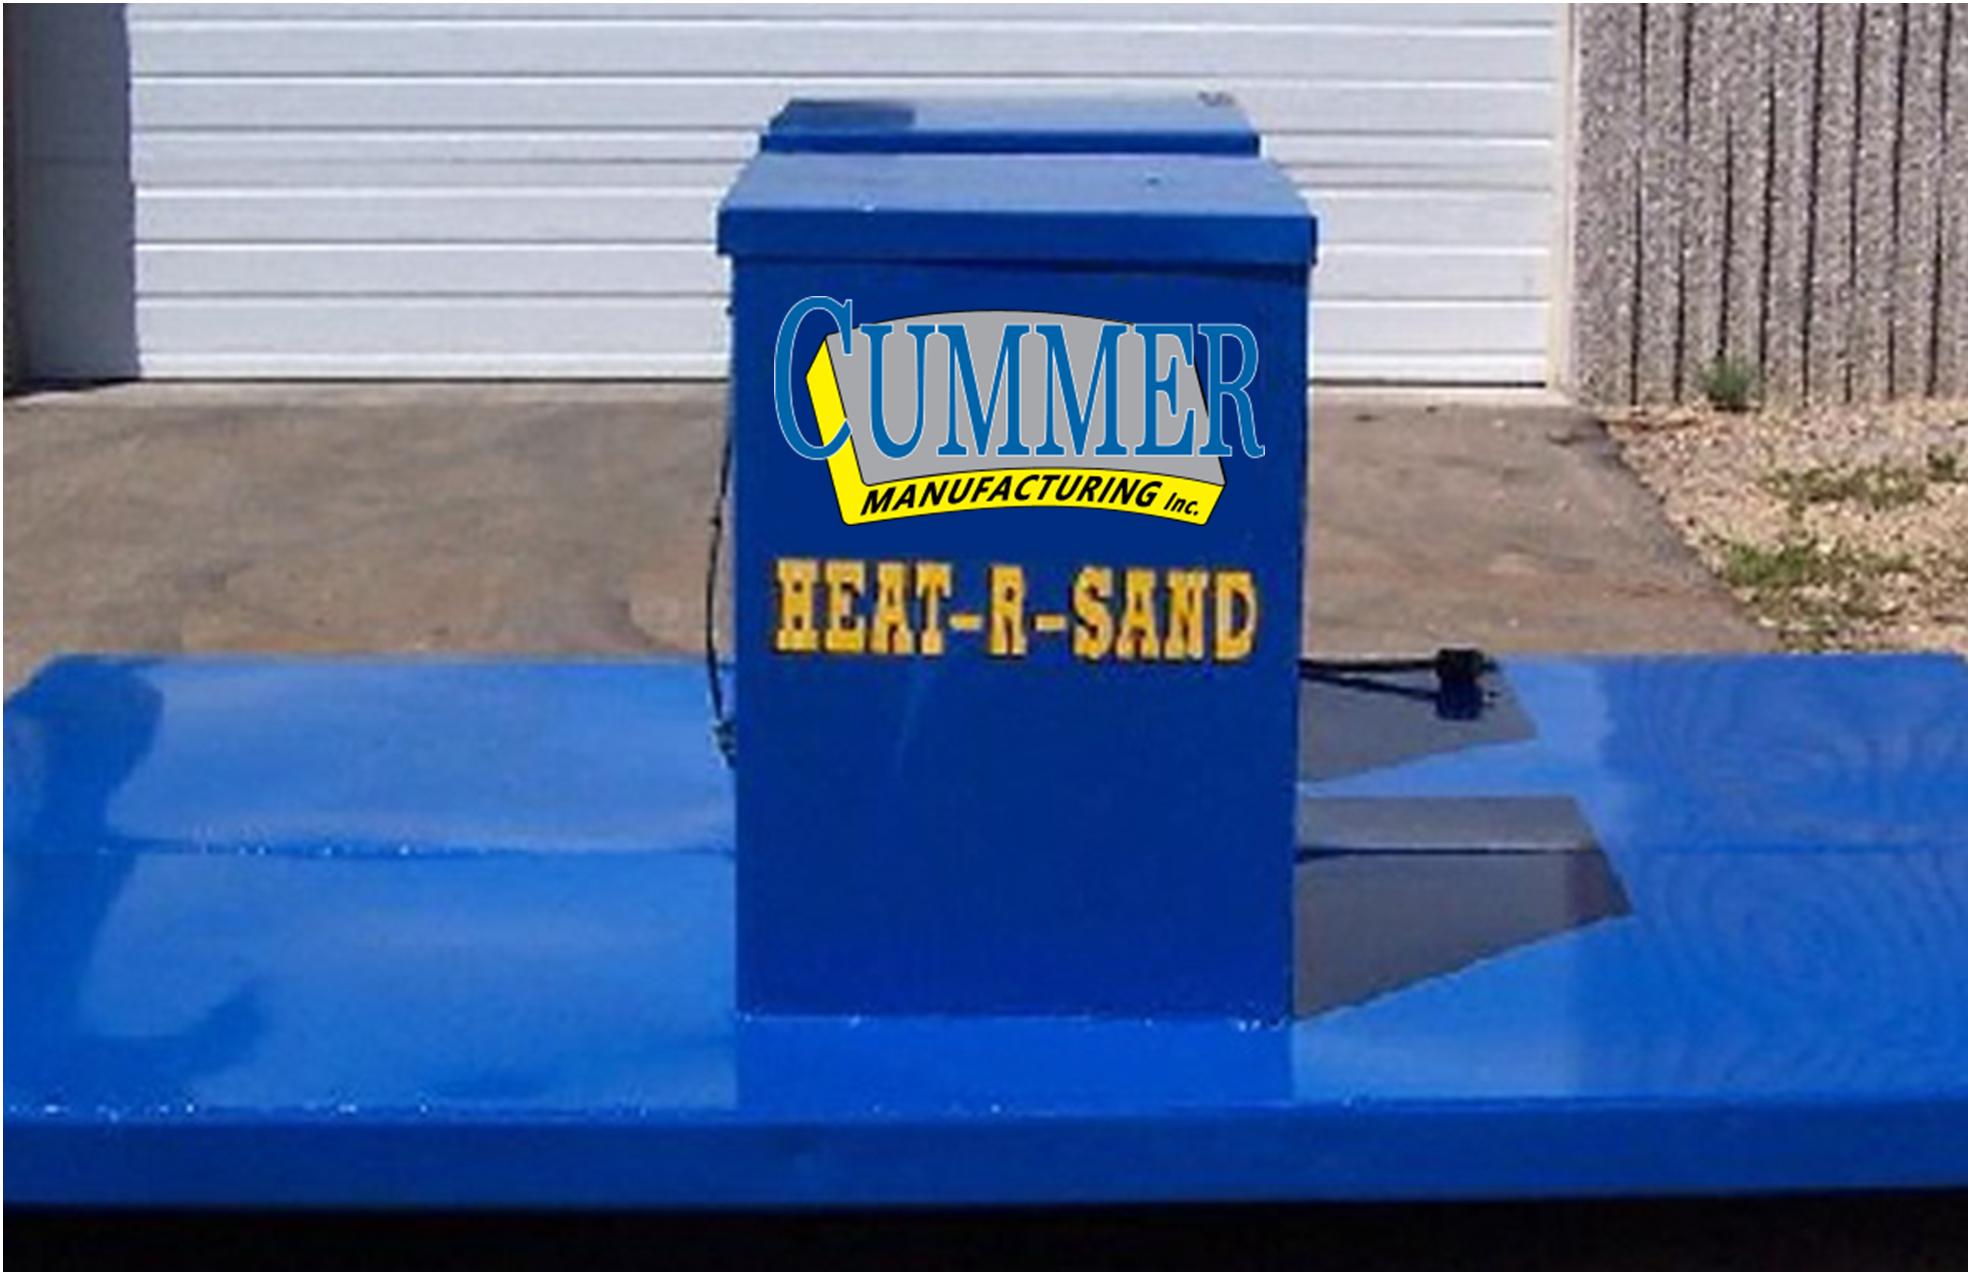 Heat-R-Sand